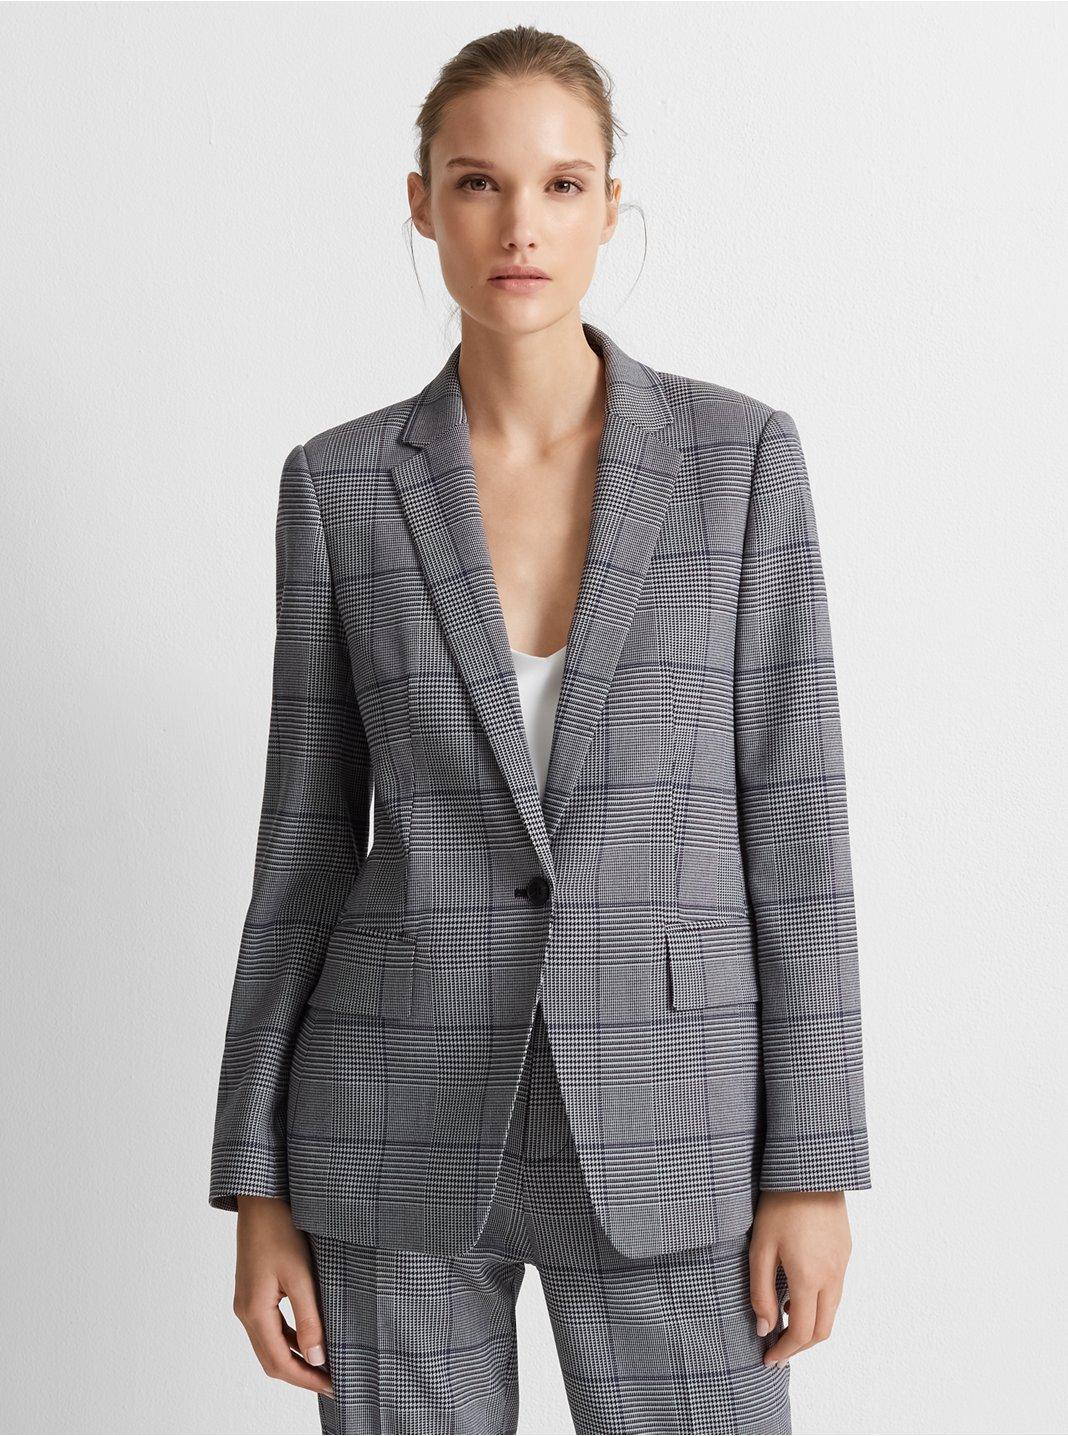 506c55ca Womens Jackets and Vests | Club Monaco